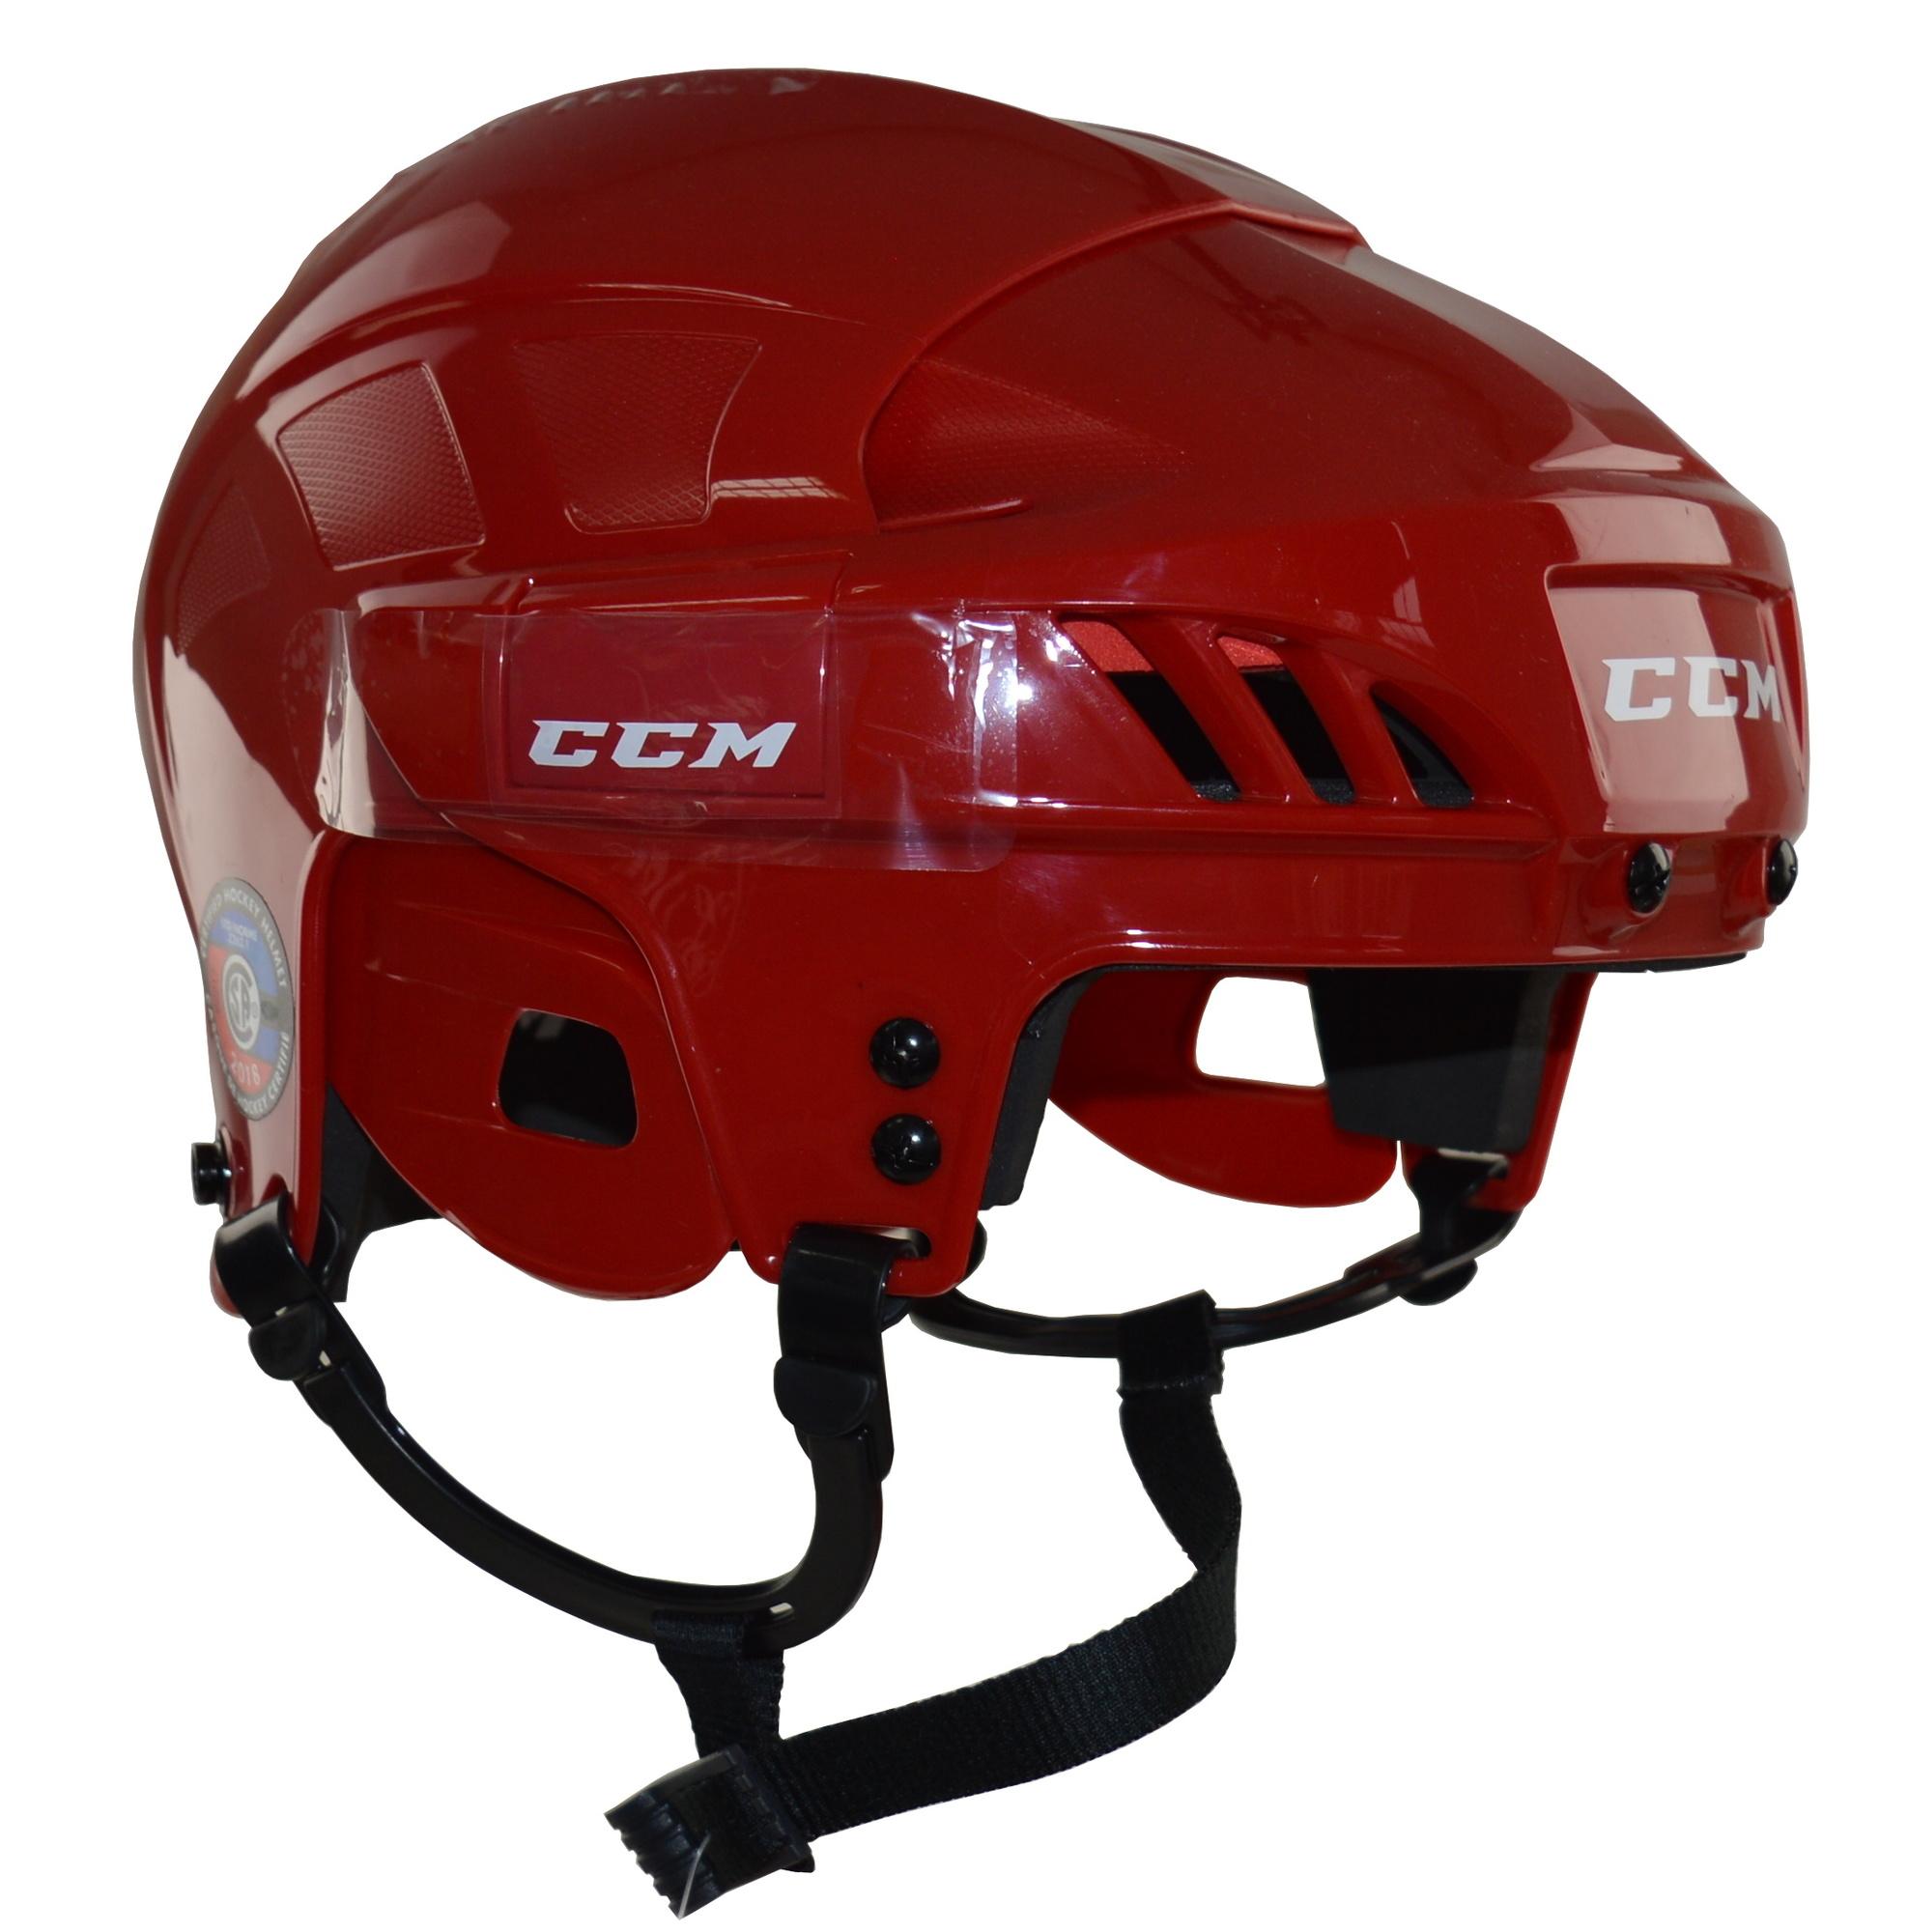 Helma CCM 50 SR, červená, Senior, M, 55-59cm